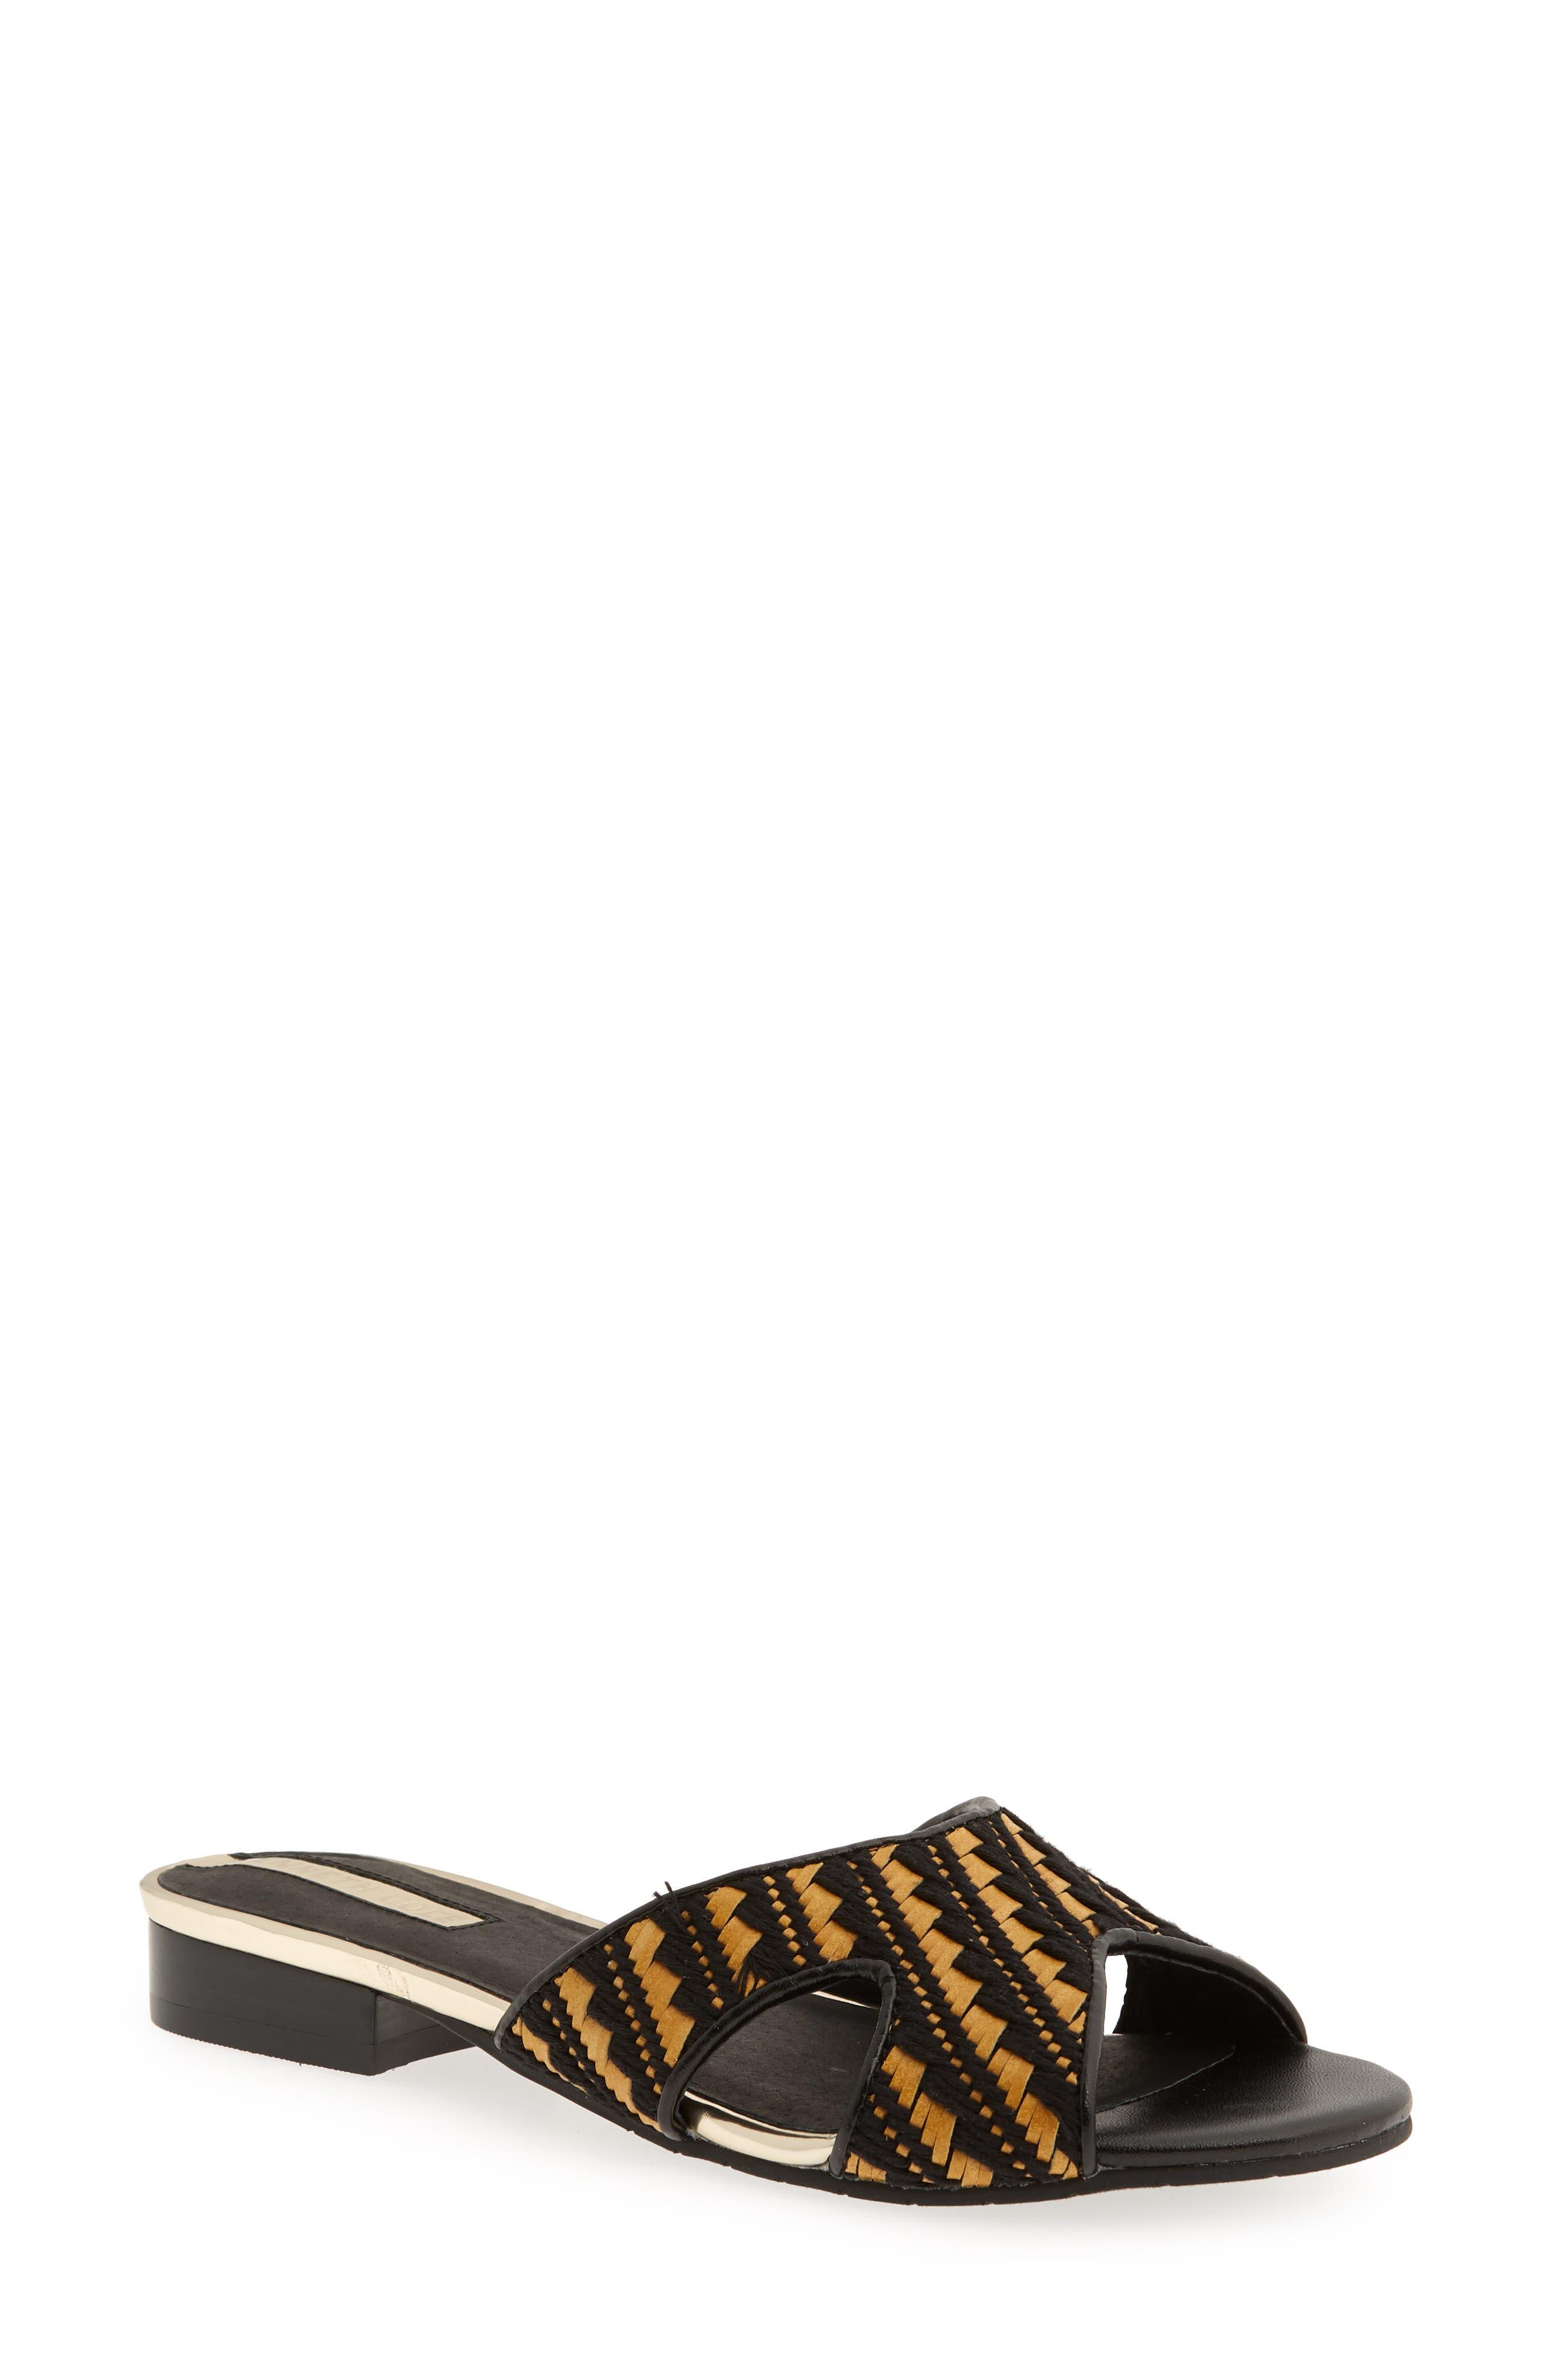 Viveca 2 Slide Sandal,                         Main,                         color, Black/ Natural Fabric